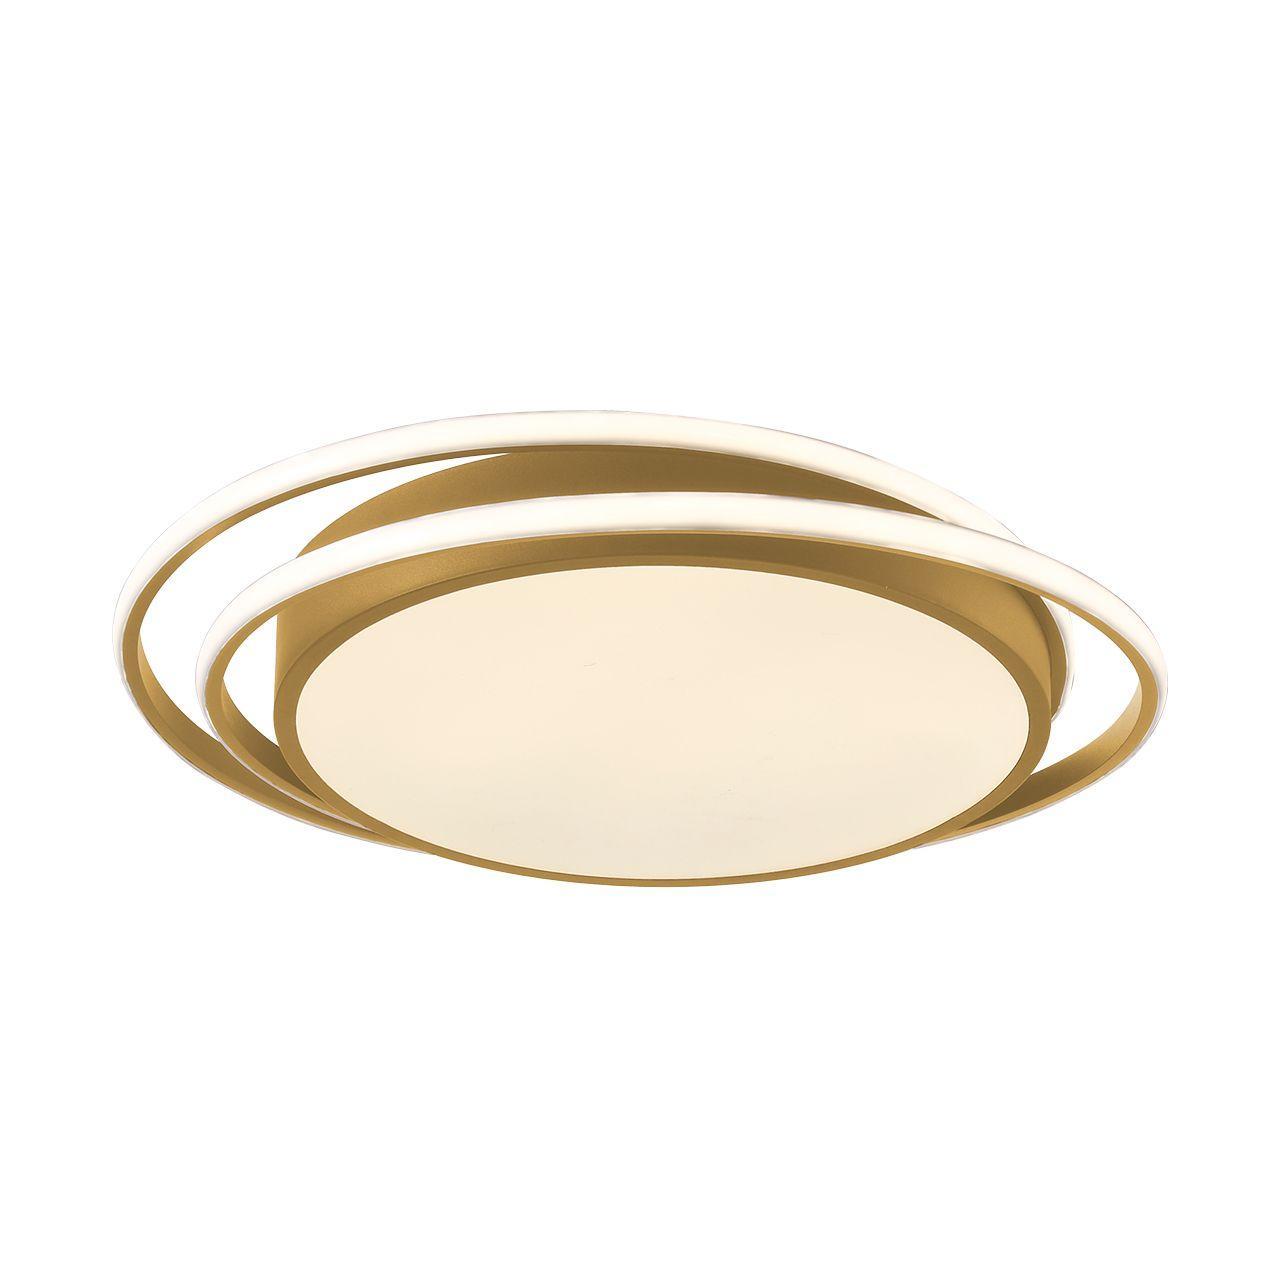 Plafón Led Oro 50 cm Kansas Circular